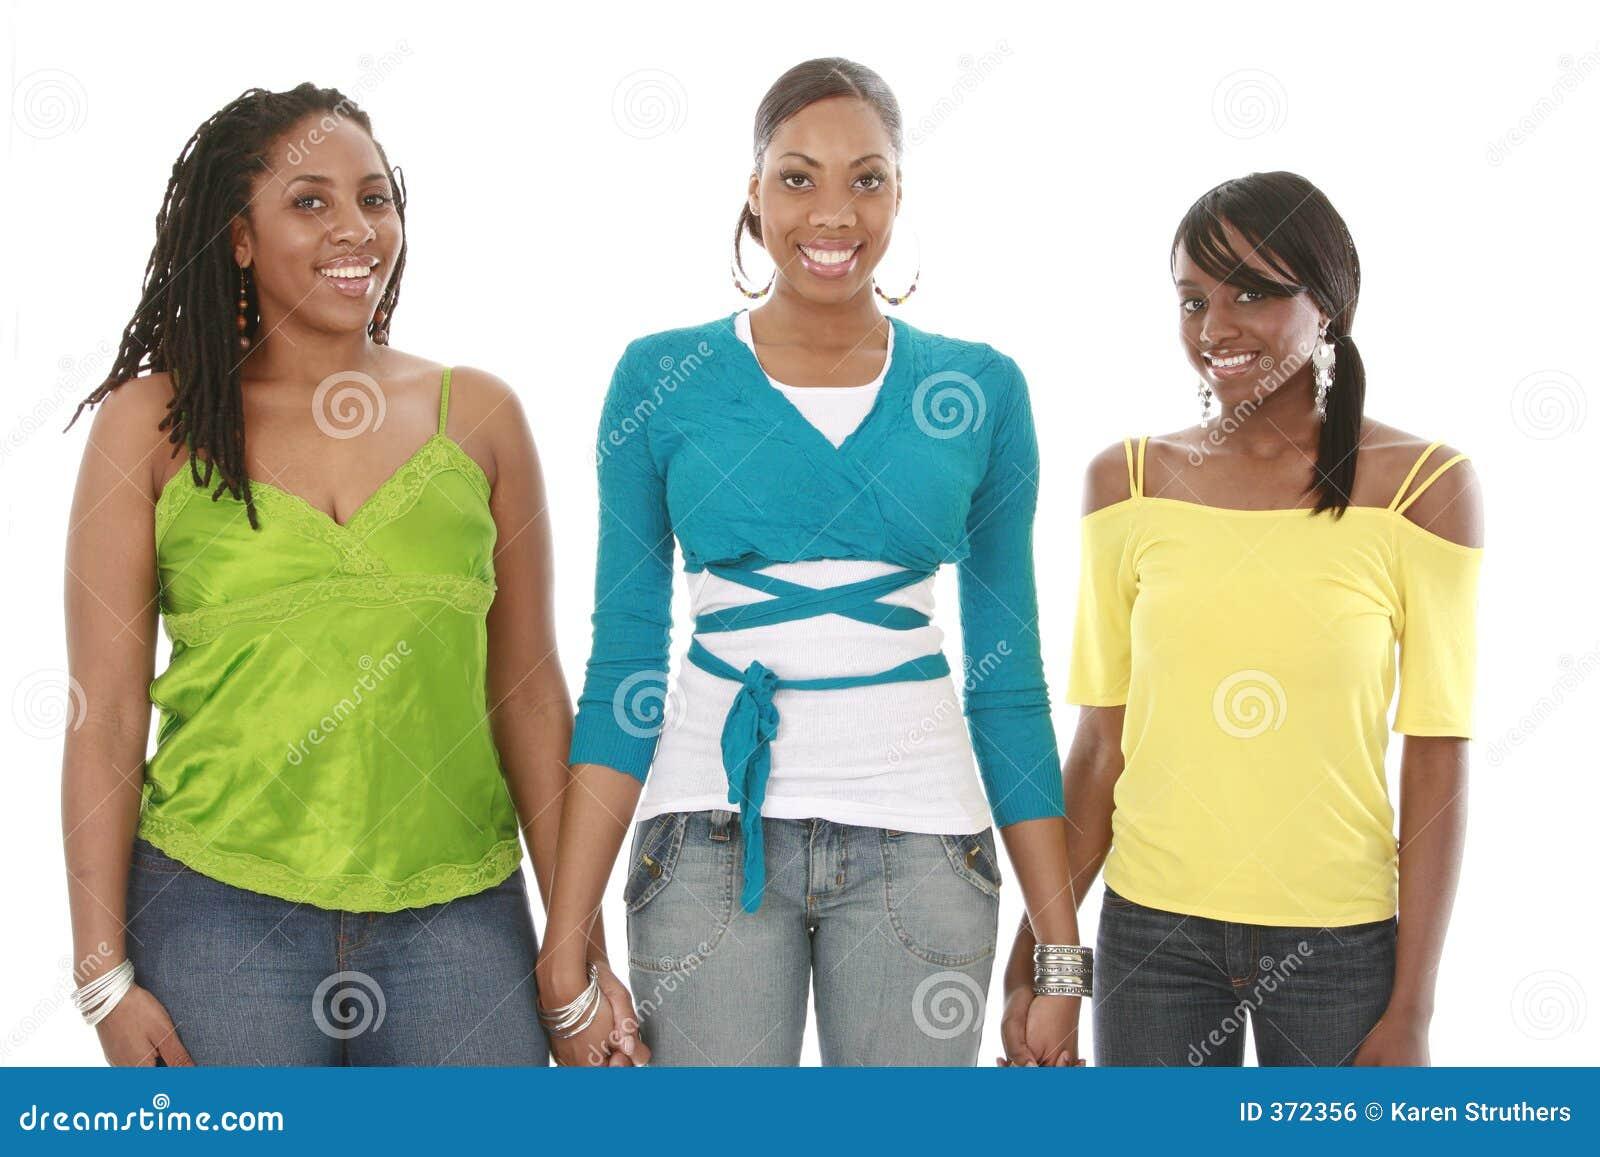 Friends girl hands holding